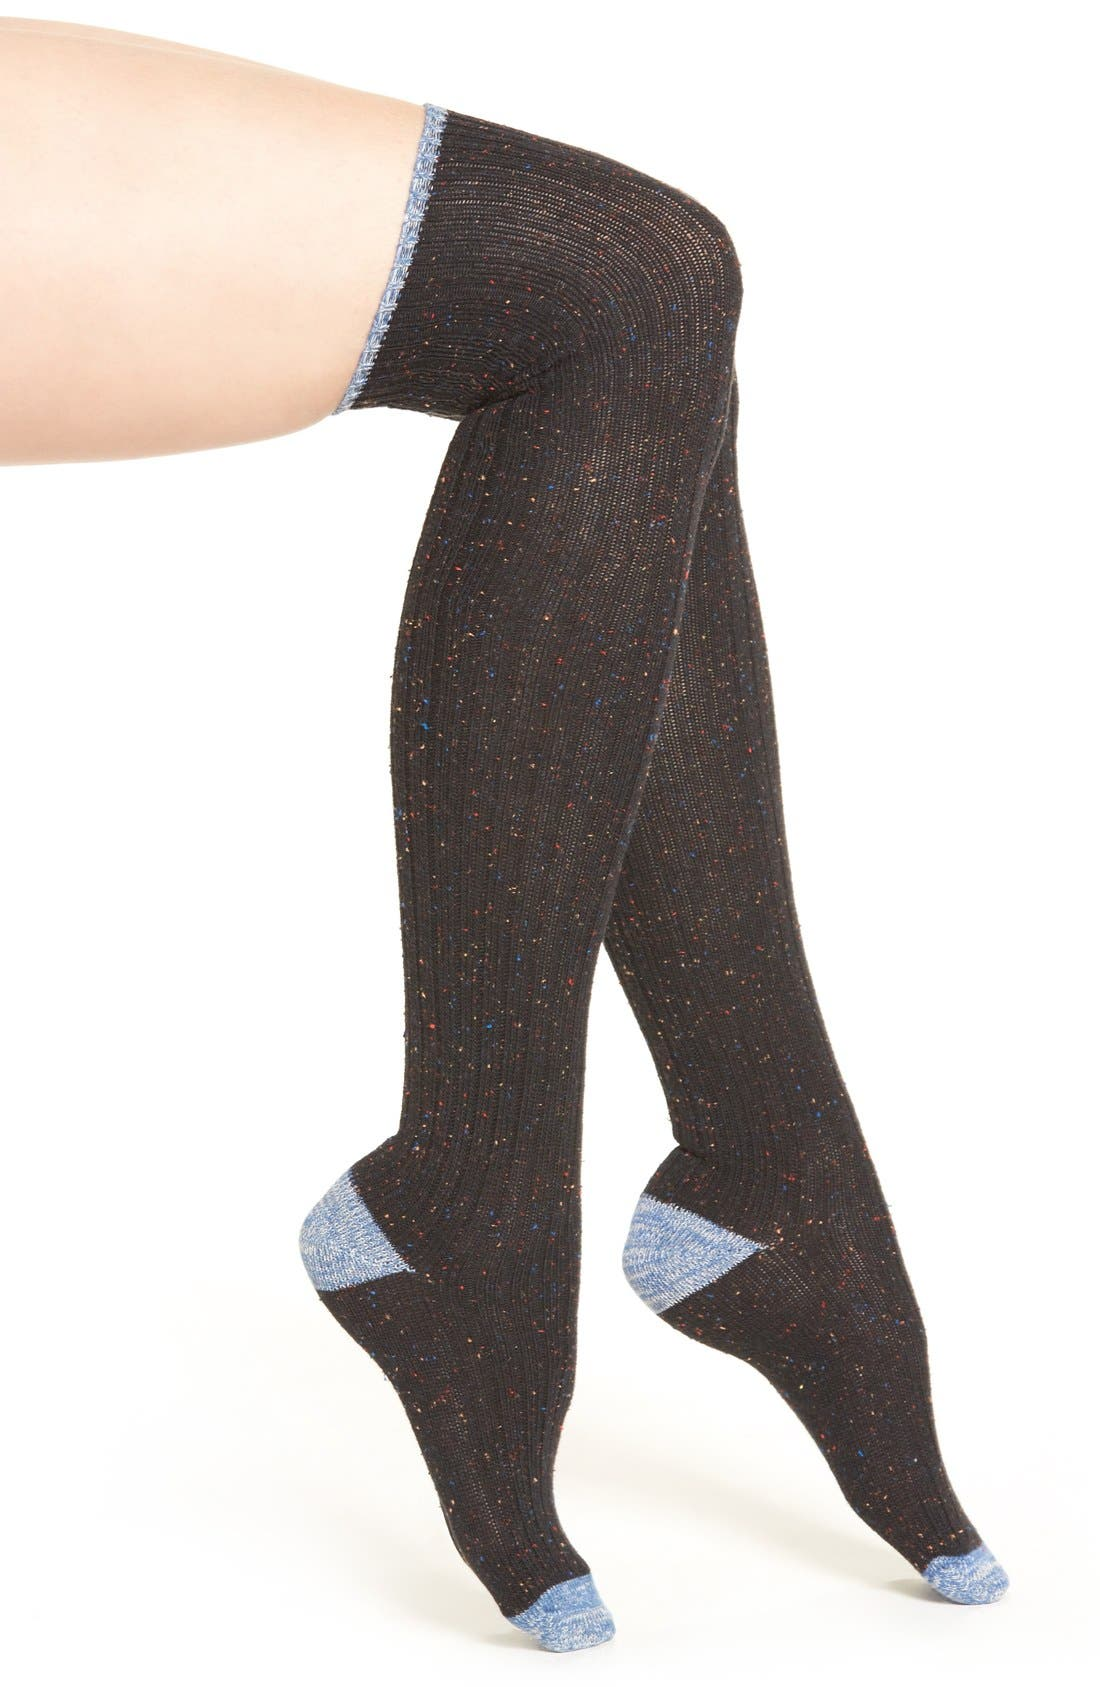 Main Image - Lemon 'Falling Leaves' Over The Knee Tweed Boot Socks